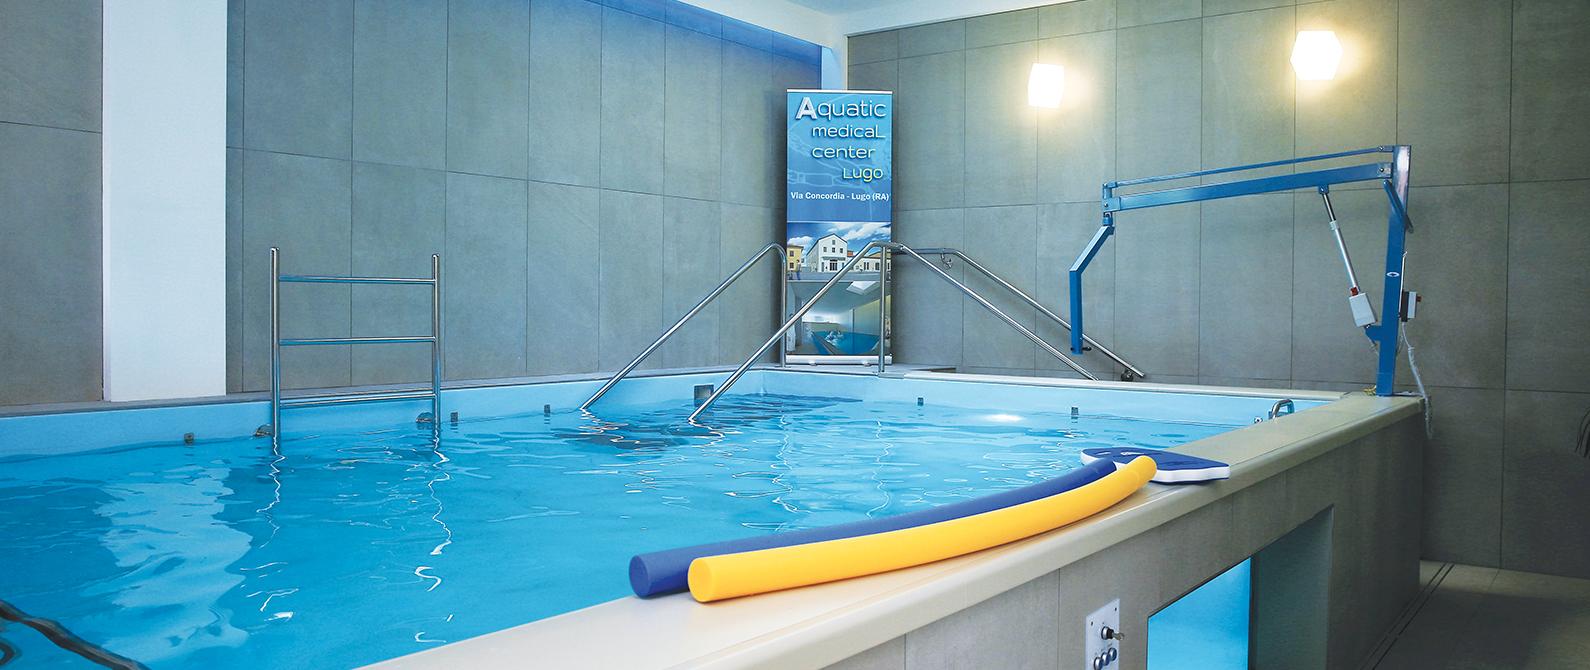 Aquatic Lugo Ravenna